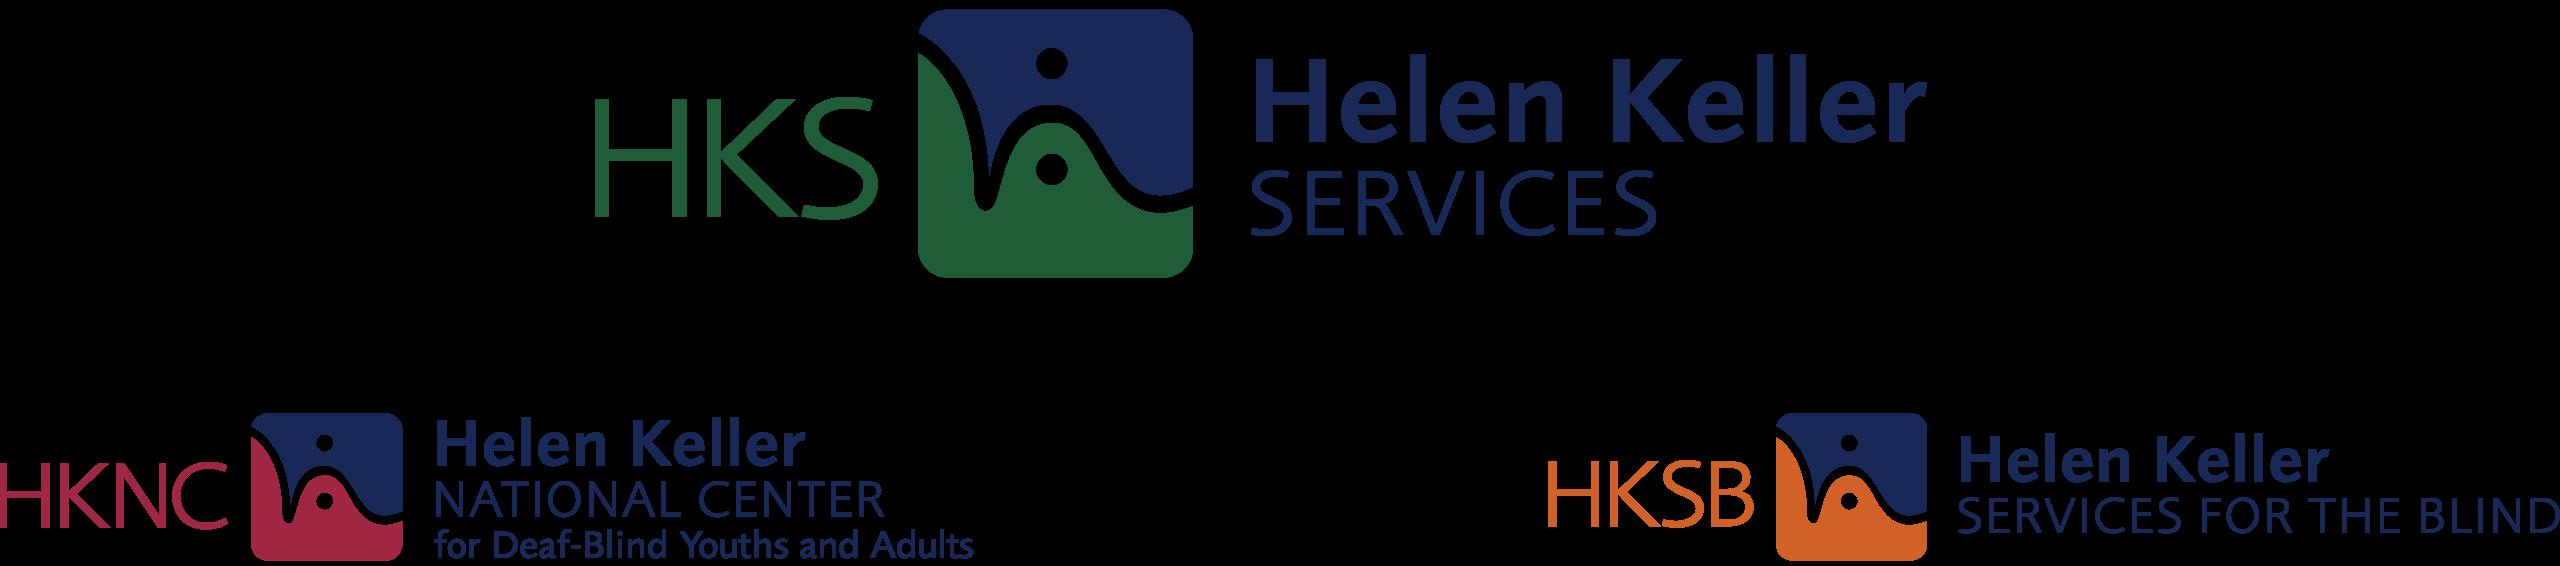 Presented by Helen Keller Services